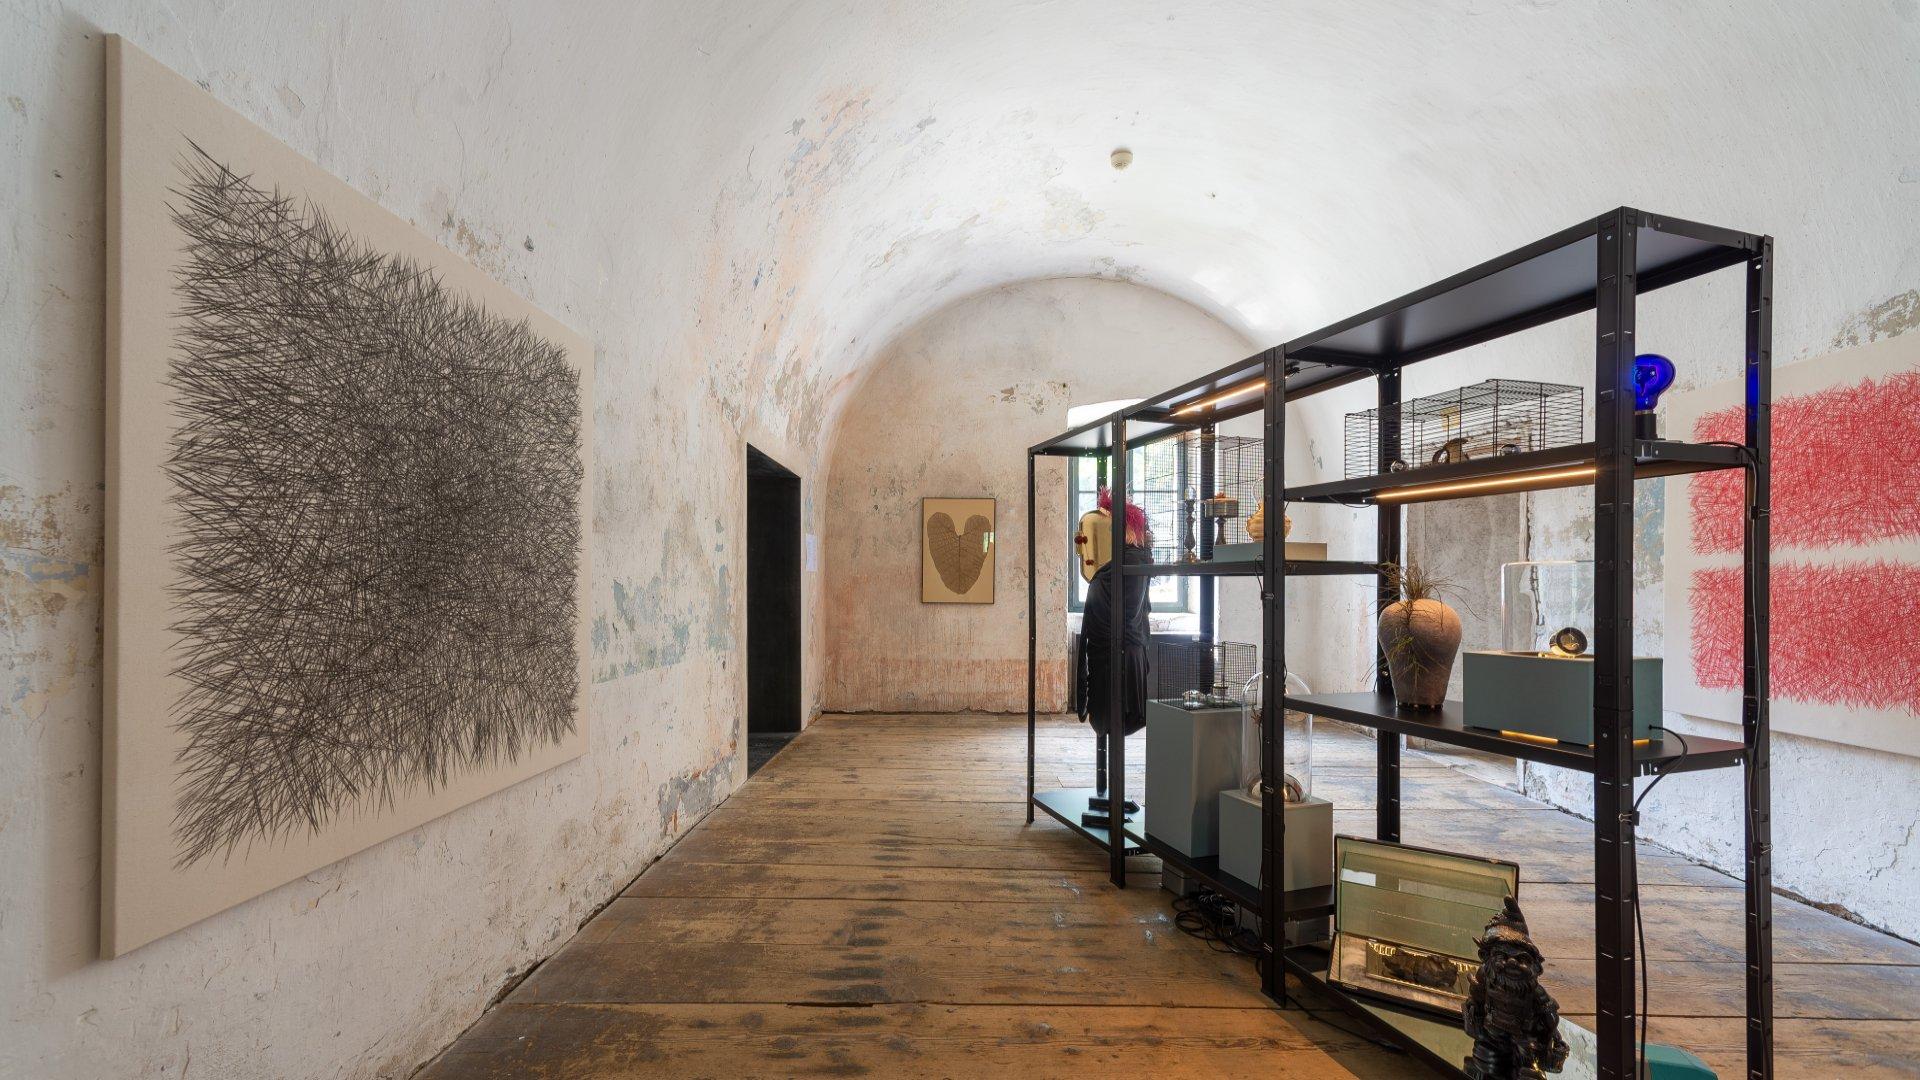 ExperimentalSetup_Festung_franzenfeste2021_hic_sunt_dragones_Austellungsansicht4